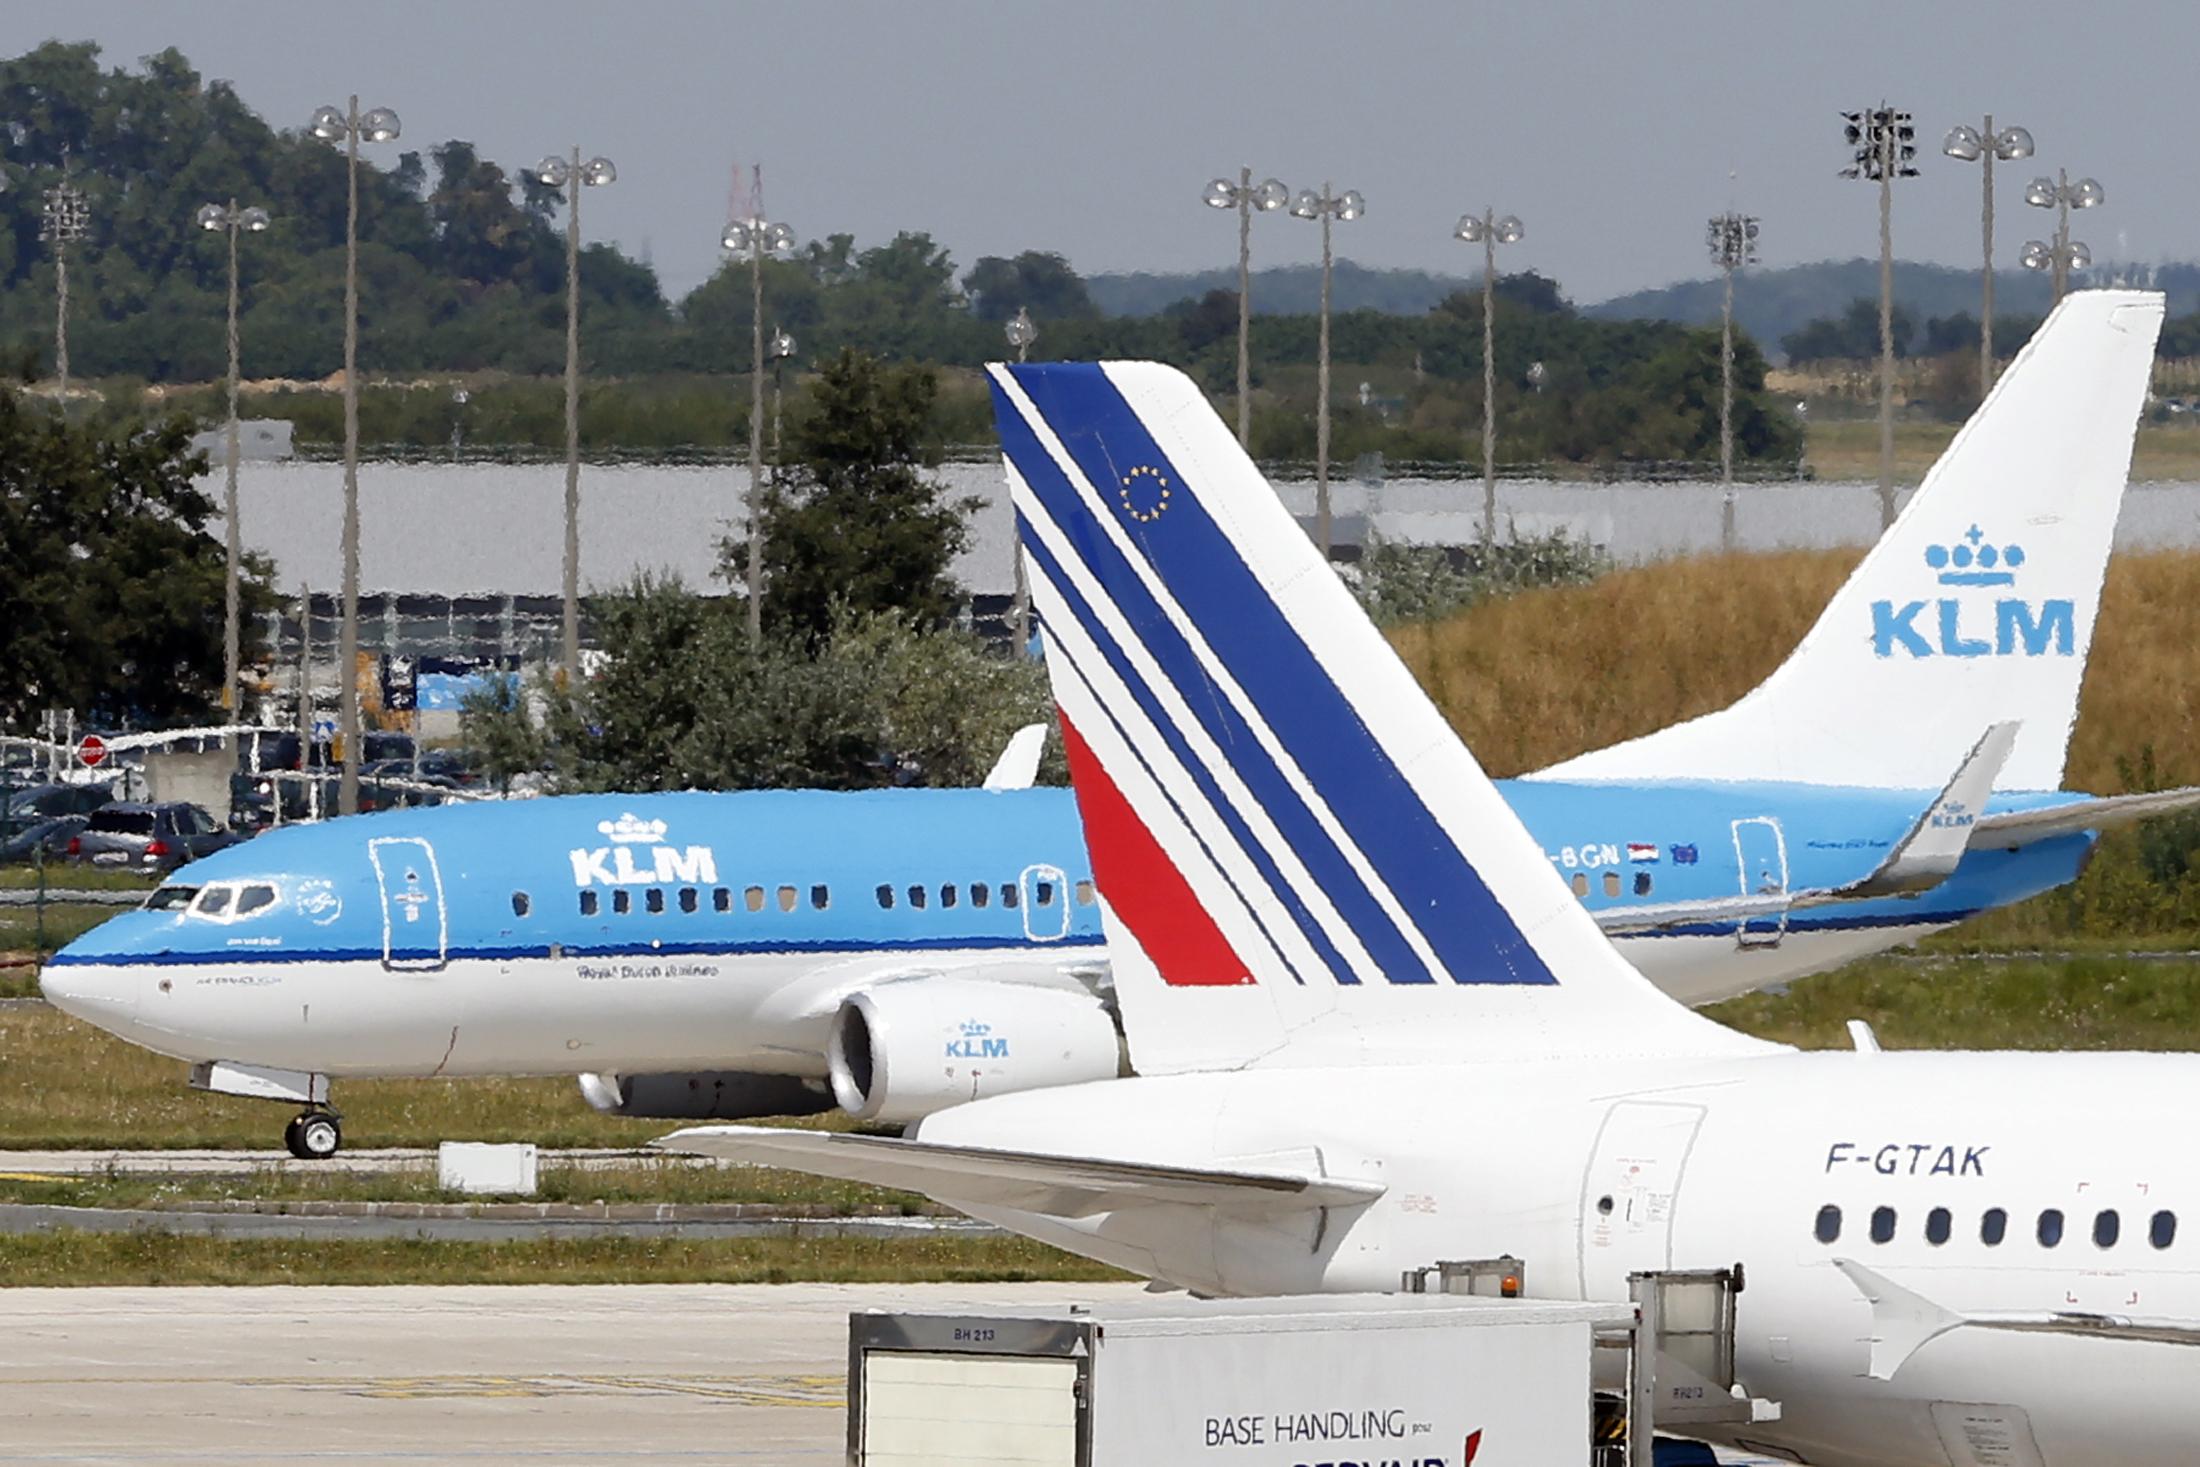 air-france-klm-compagnie-aerienne-groupe-francais